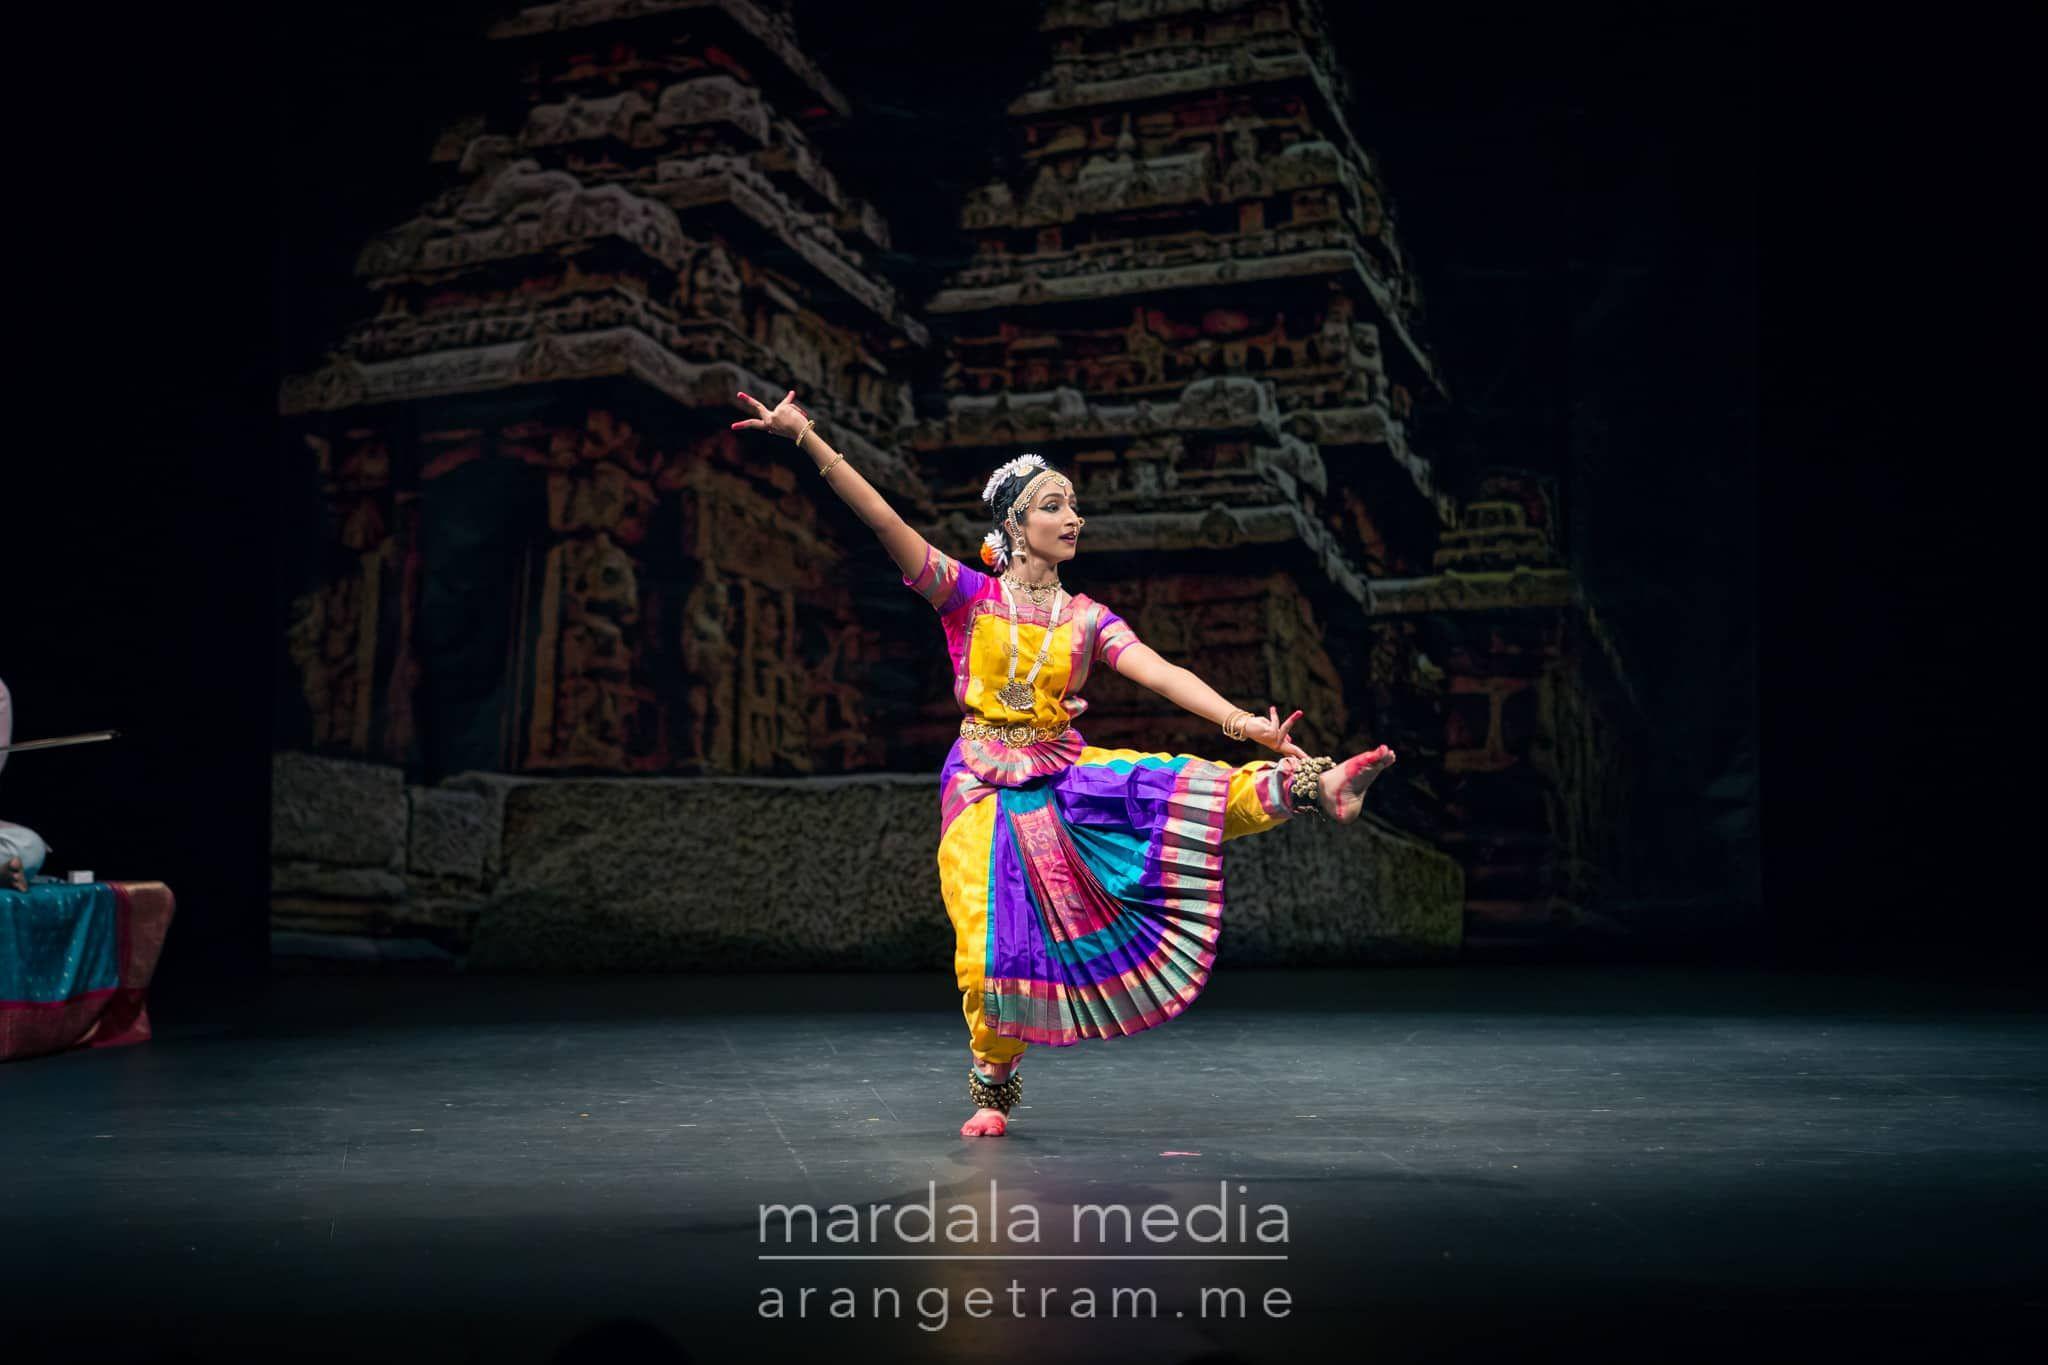 Pin by Mardala Media on arangetram me - Indian Classical